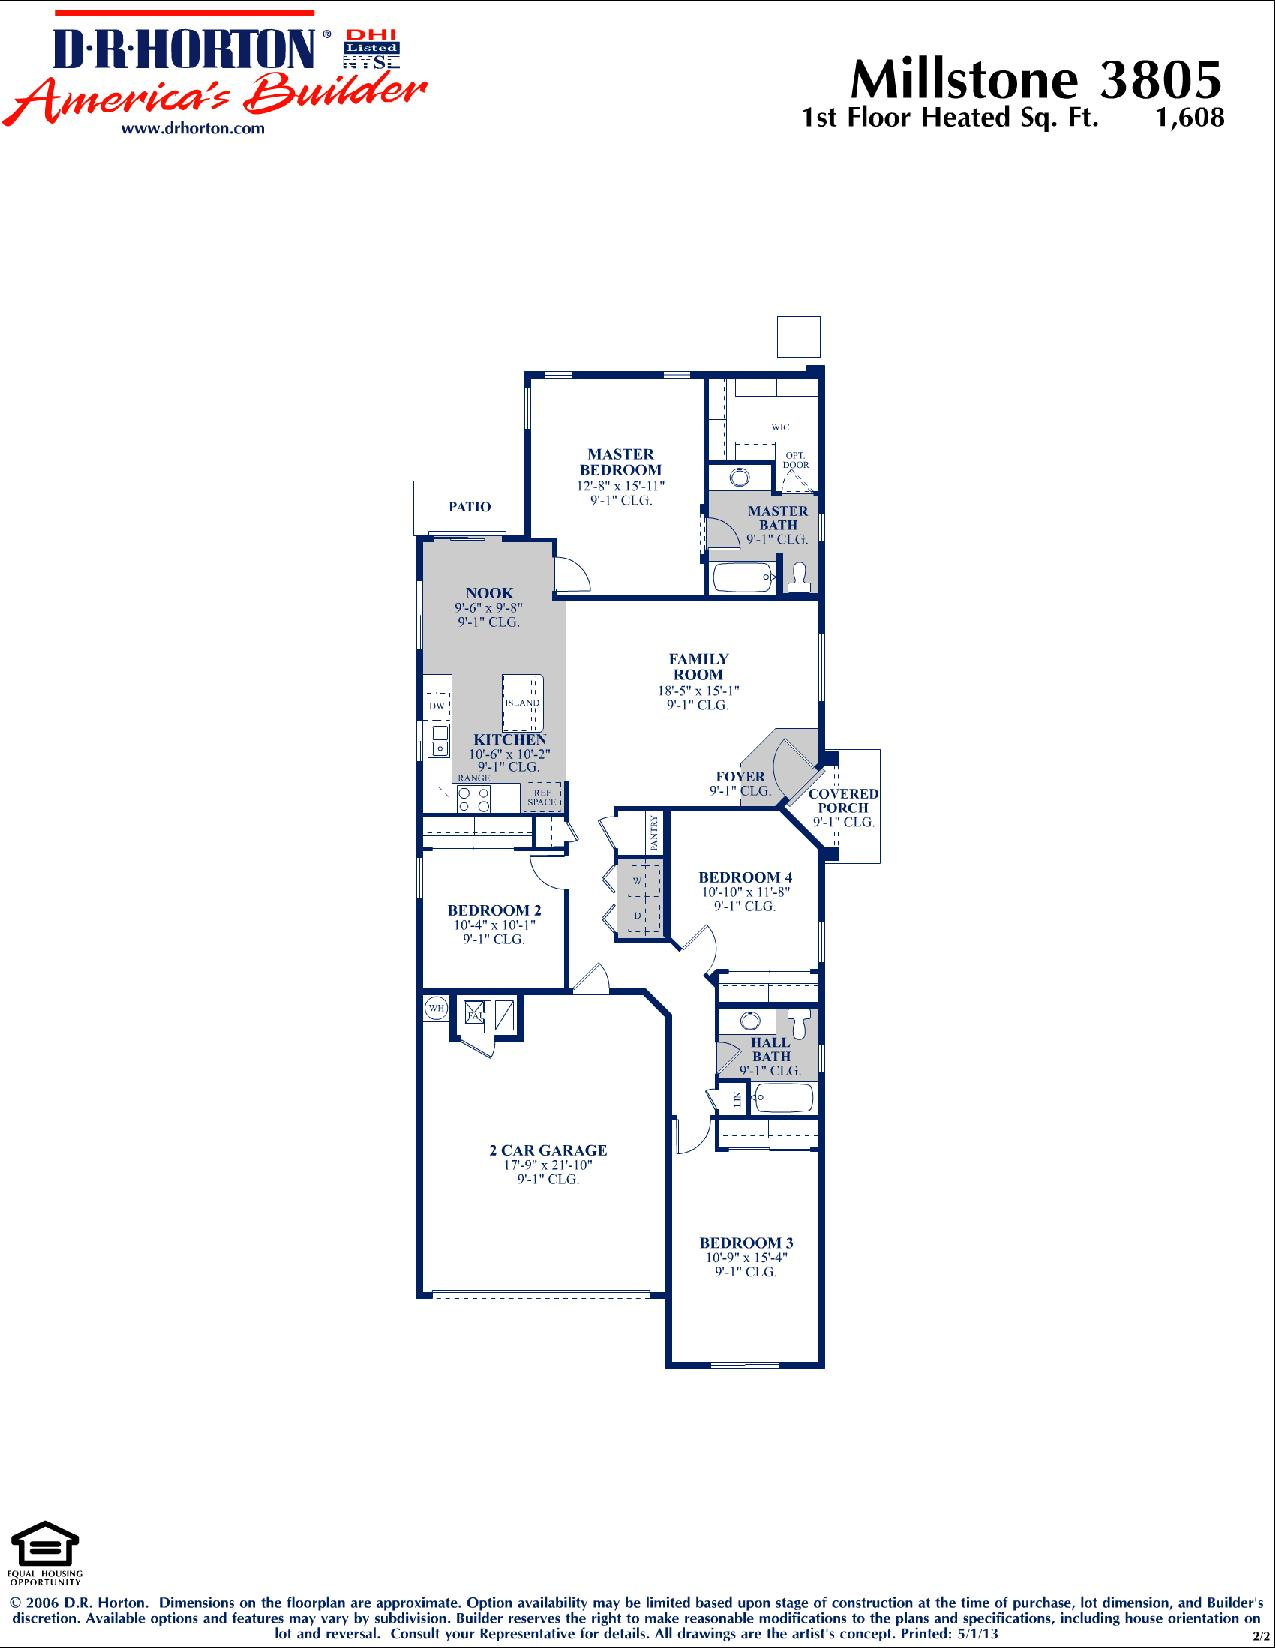 Dr Horton Millstone Floor Plan